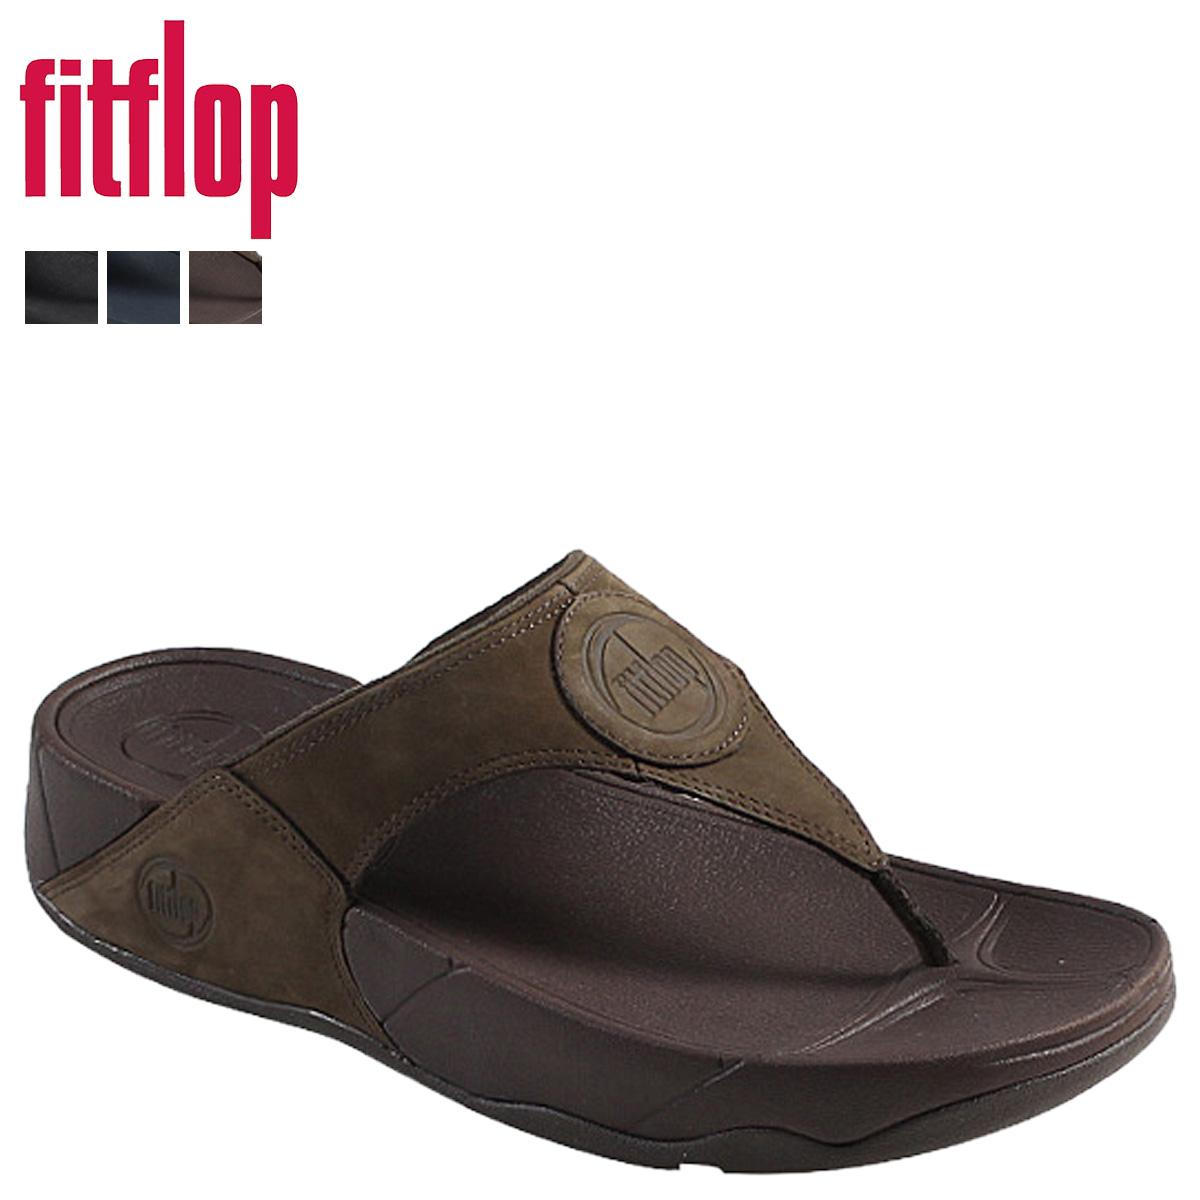 e16c189bd29645 ALLSPORTS: Fit flops FitFlop walk star sandal 211-001 211-097 211 ...